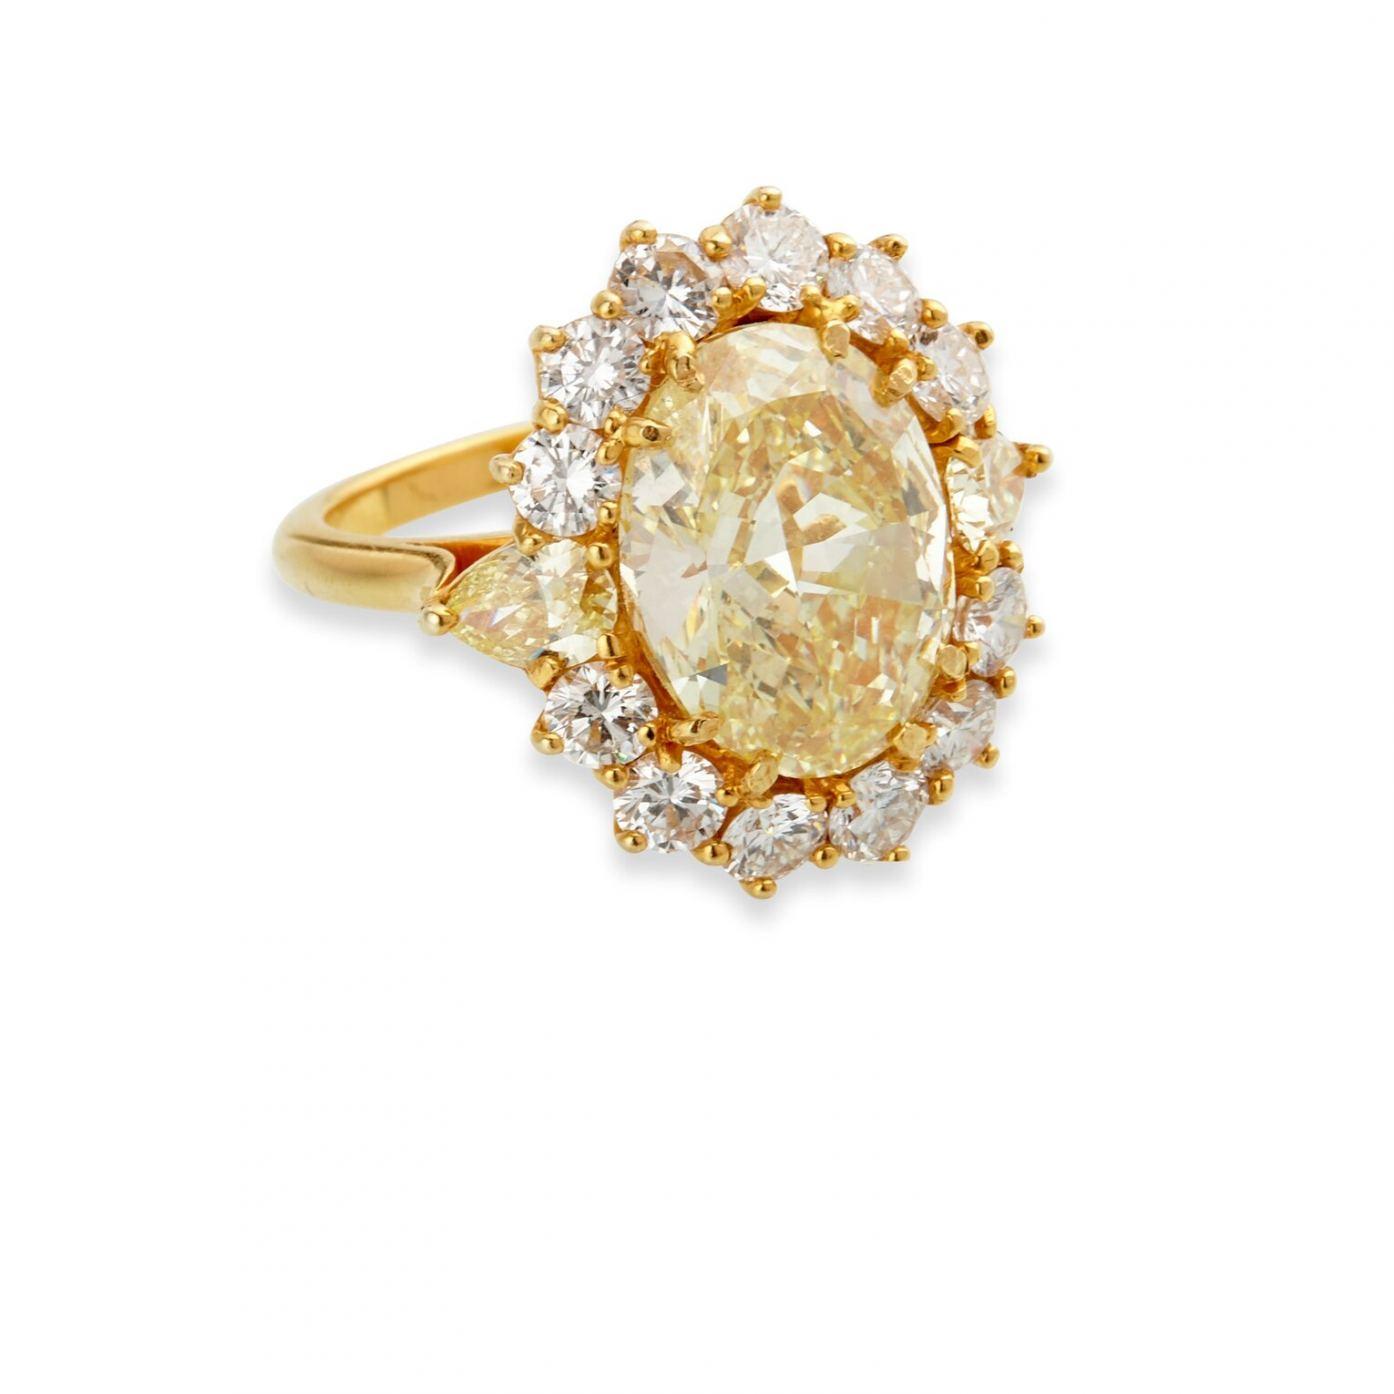 Tiffany 5.41-carat oval brilliant cut diamond ring